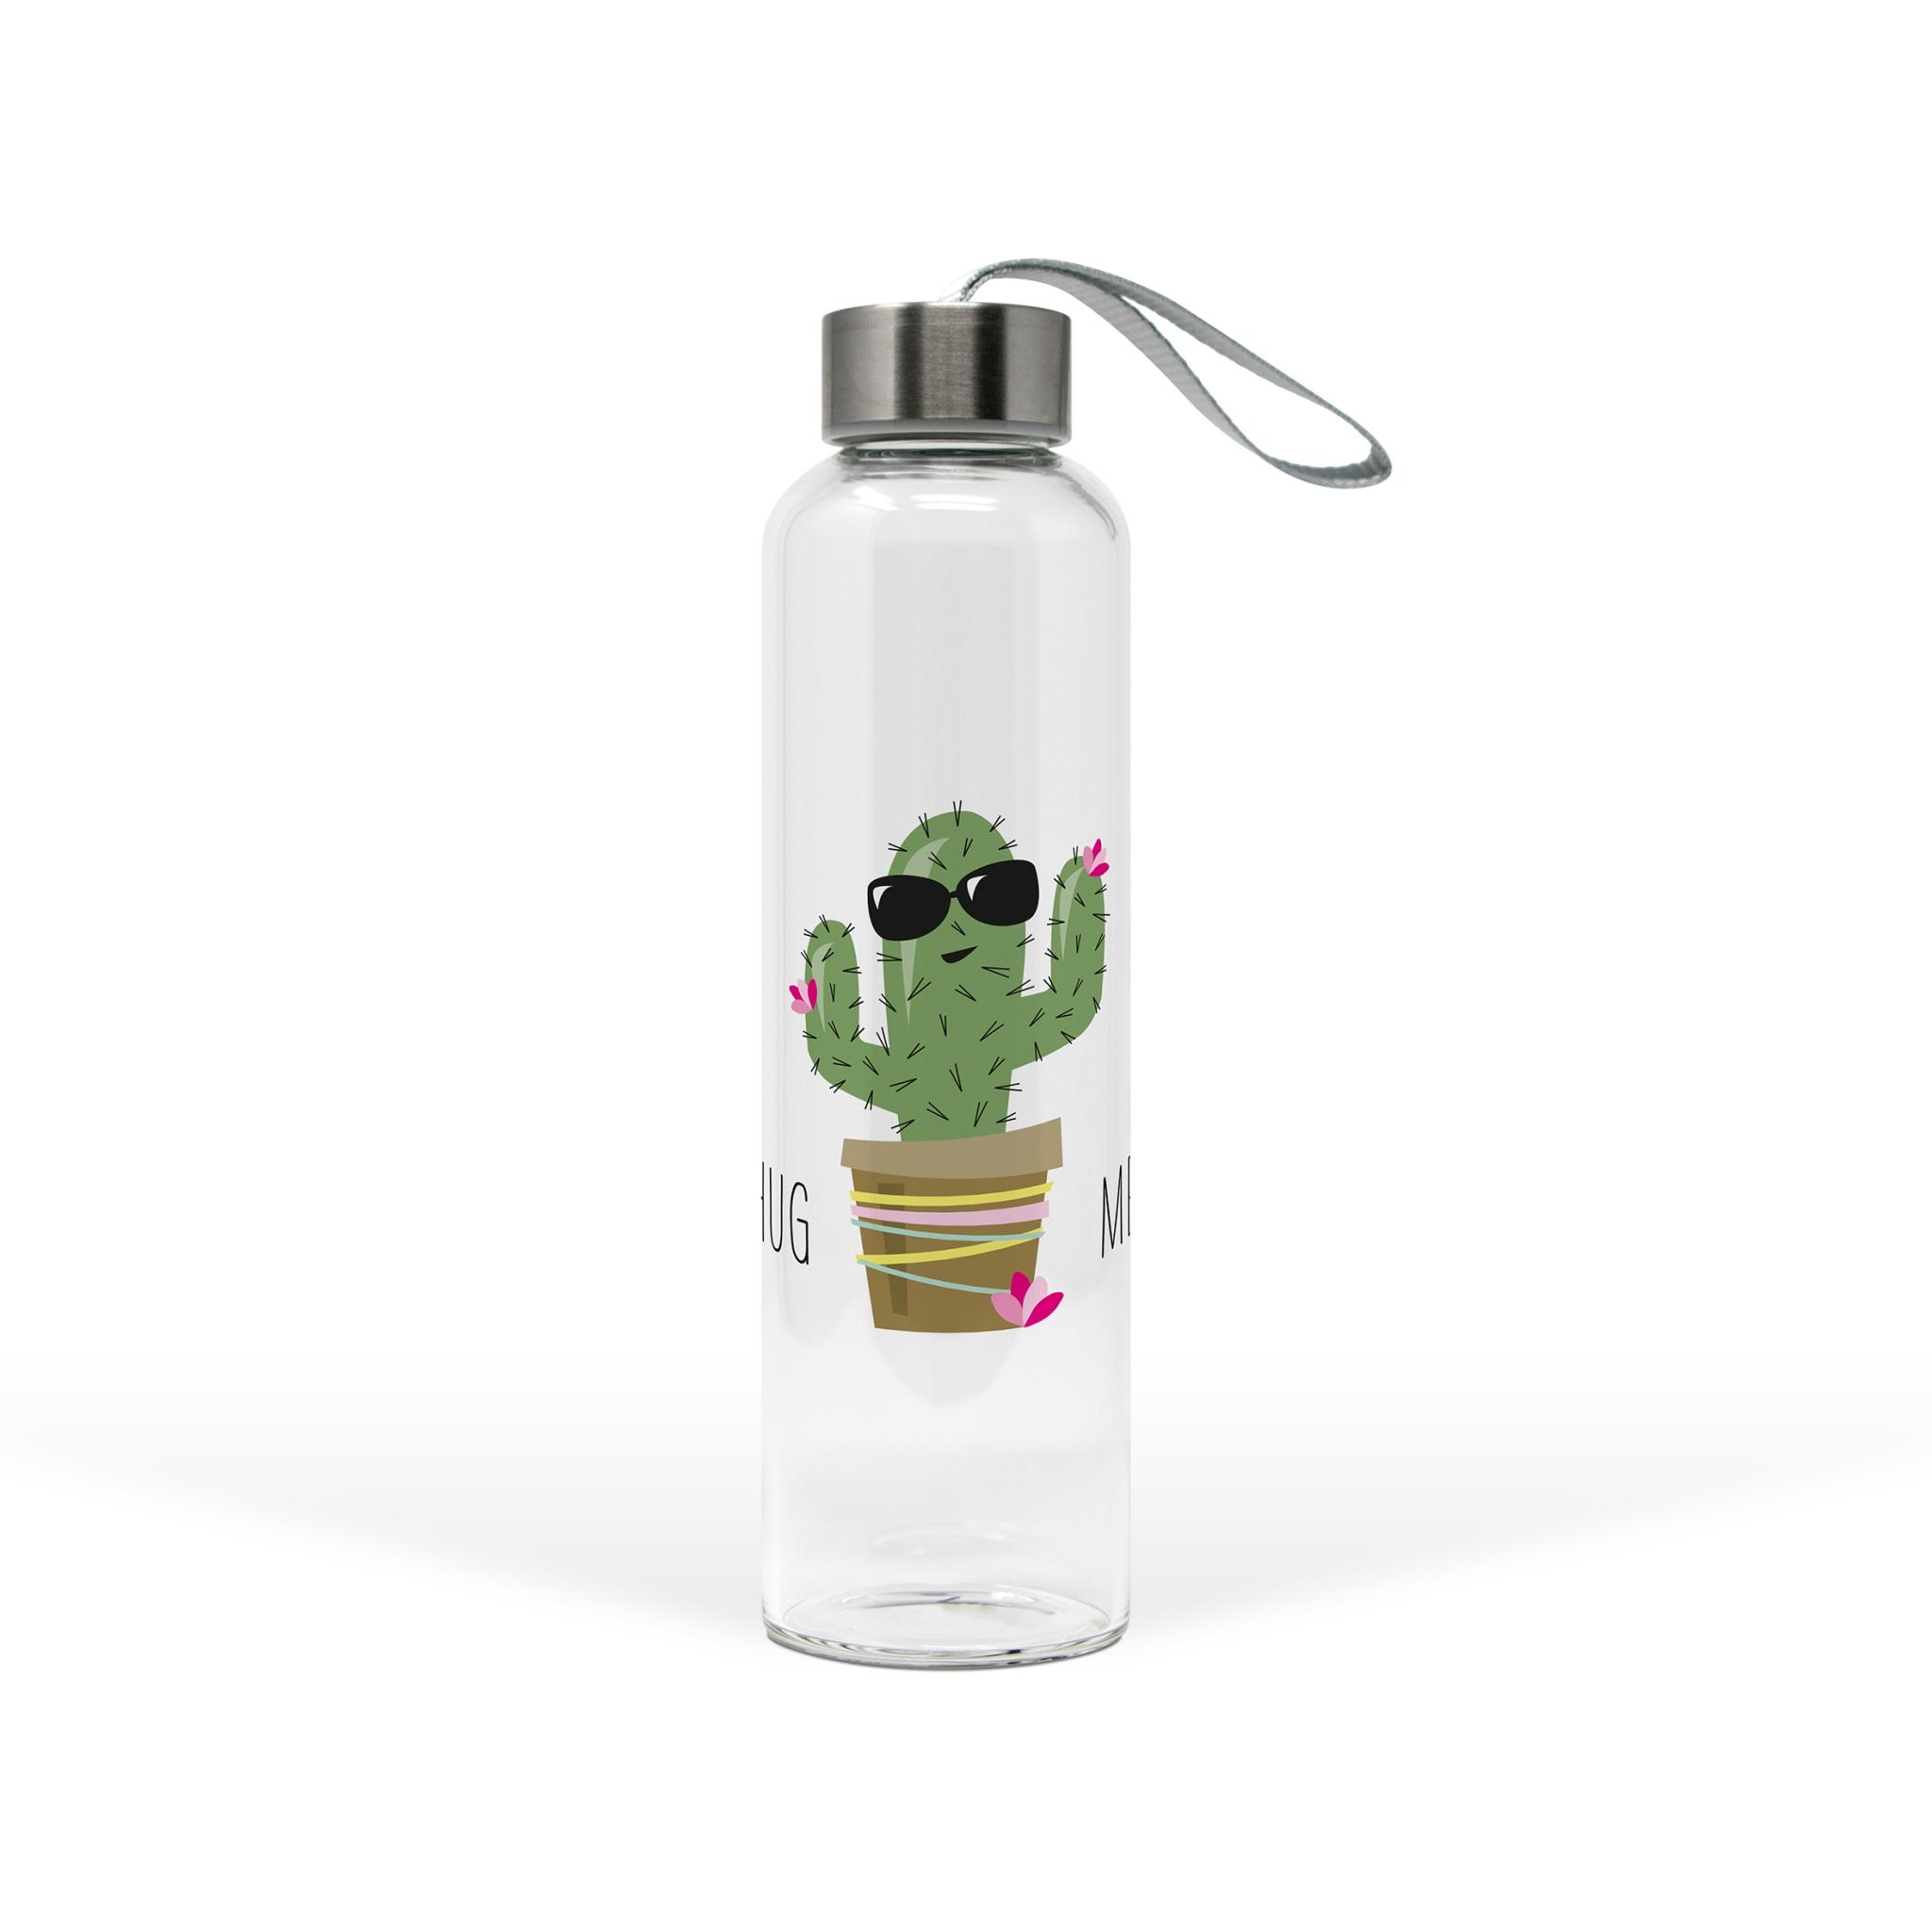 Glasflasche - Umarme mich Kaktus